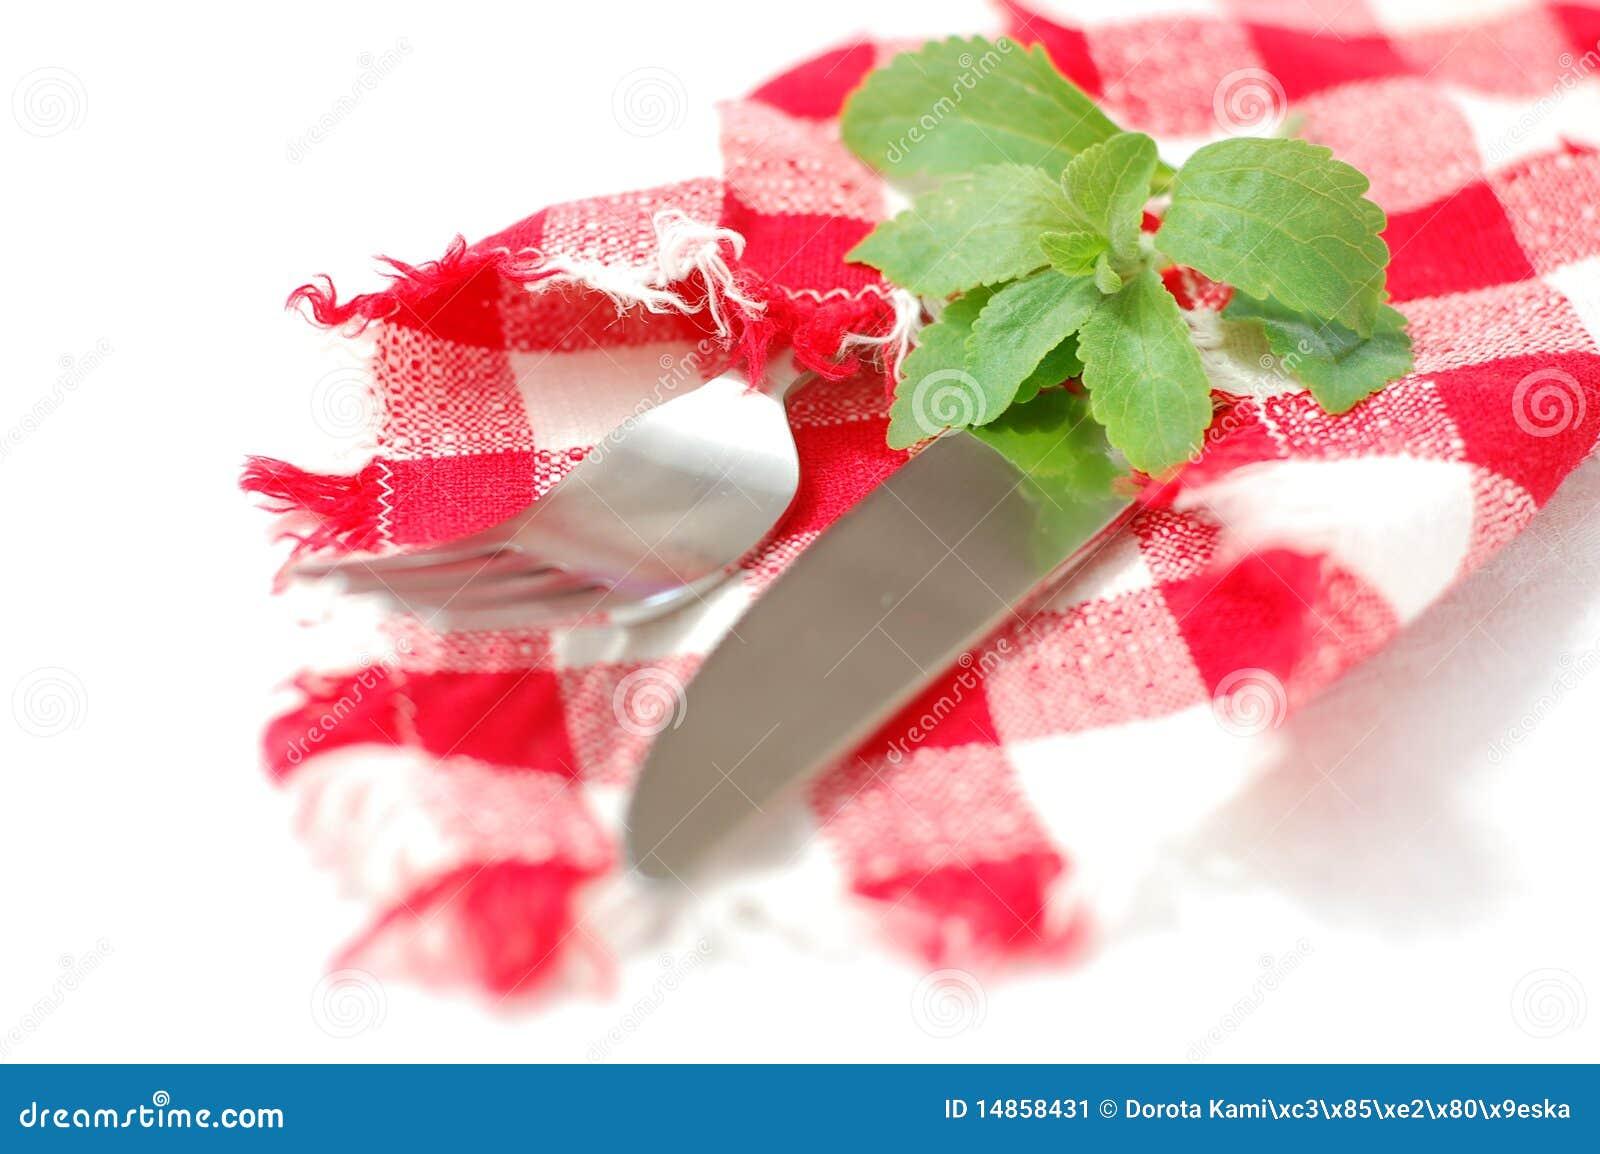 Checkered napkin, stevia and cutlery